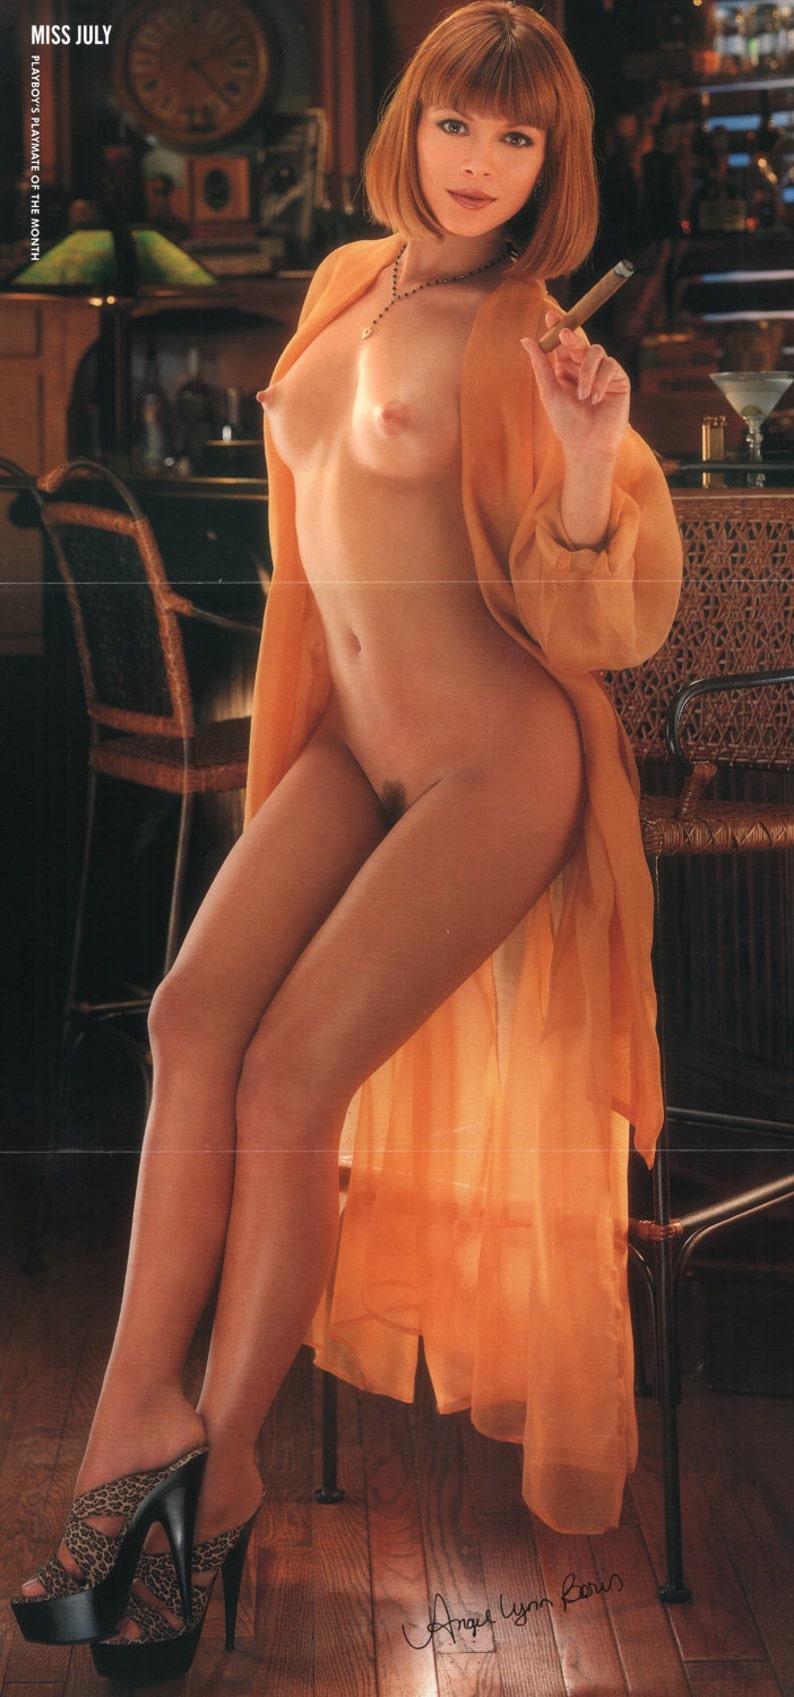 "Angel Boris Nude mature playboy july 1996 : playmate centerfold angel lynn boris taylor  gatefold 3 page spread photo wall art decor 11"" x 23"""